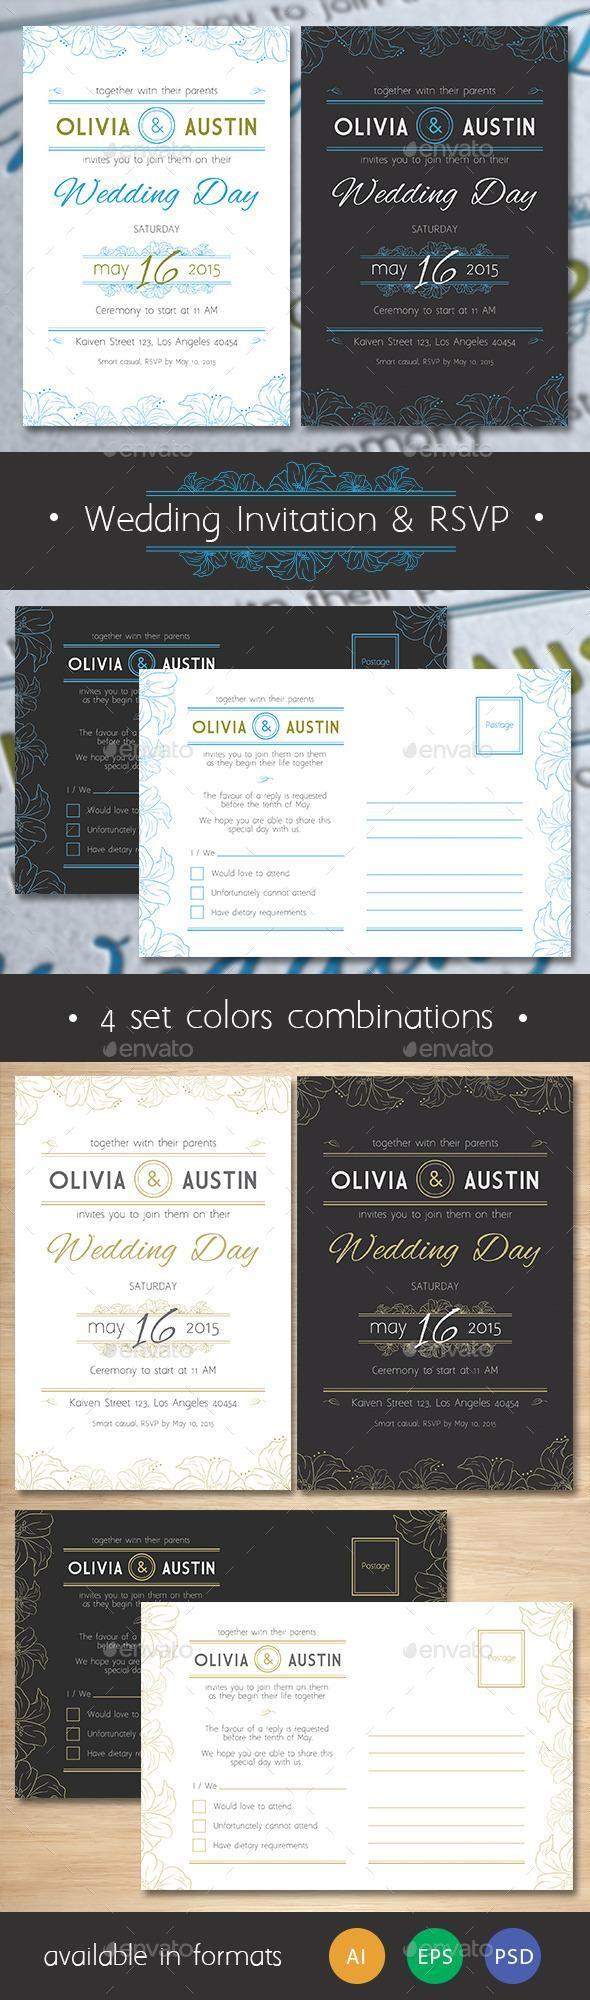 wedding invitation templates for muslim%0A Vintage Wedding Invitation  u     RSVP